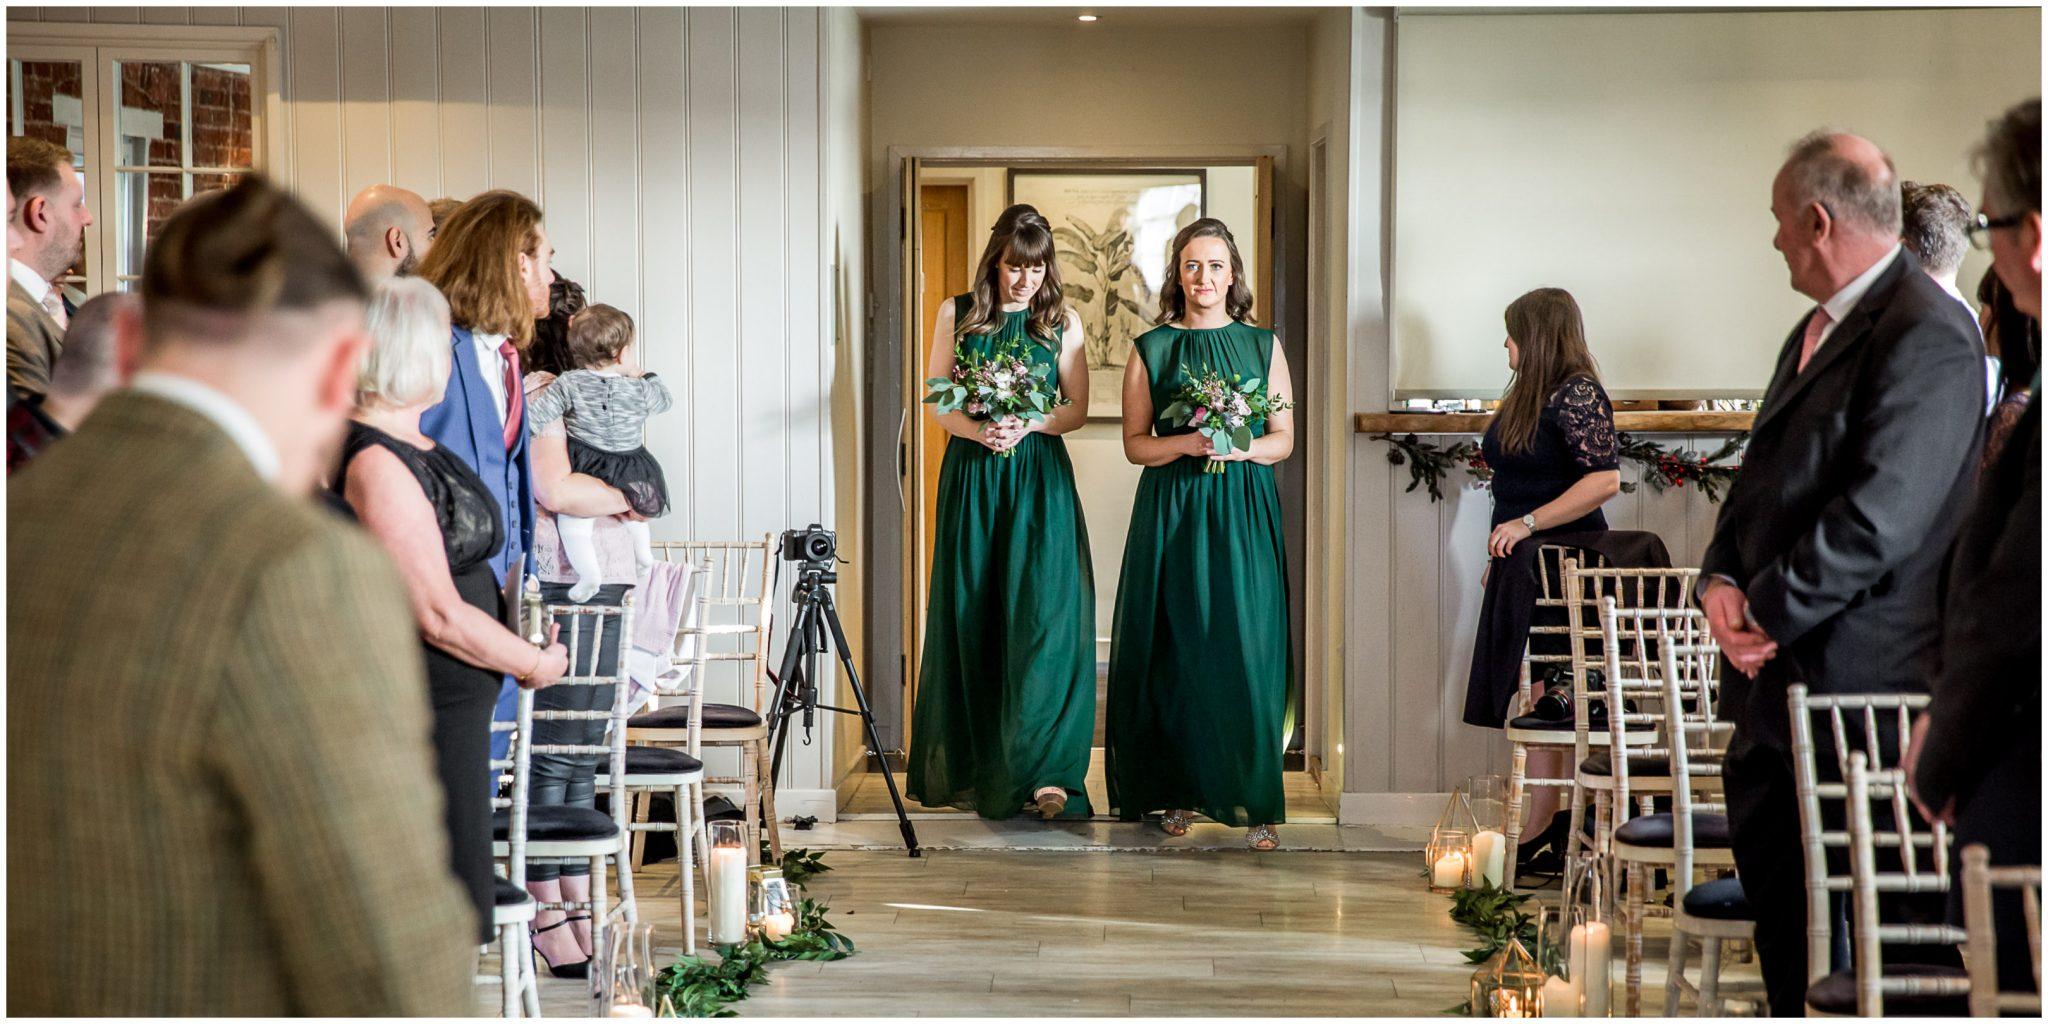 Bridesmaids enter the ceremony room ahead of the bride